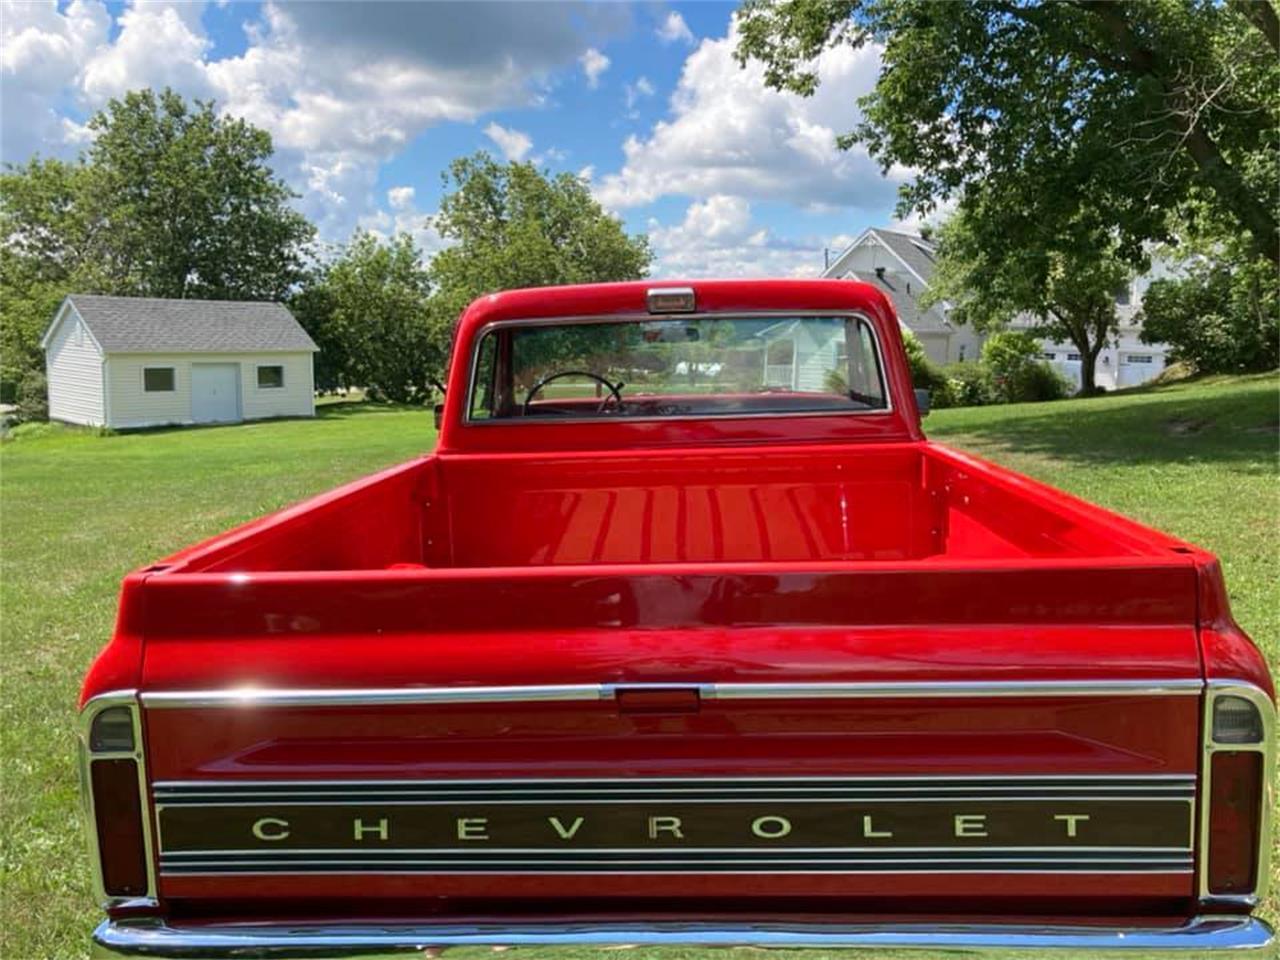 1972 Chevrolet Cheyenne (CC-1367829) for sale in Champlain, New York